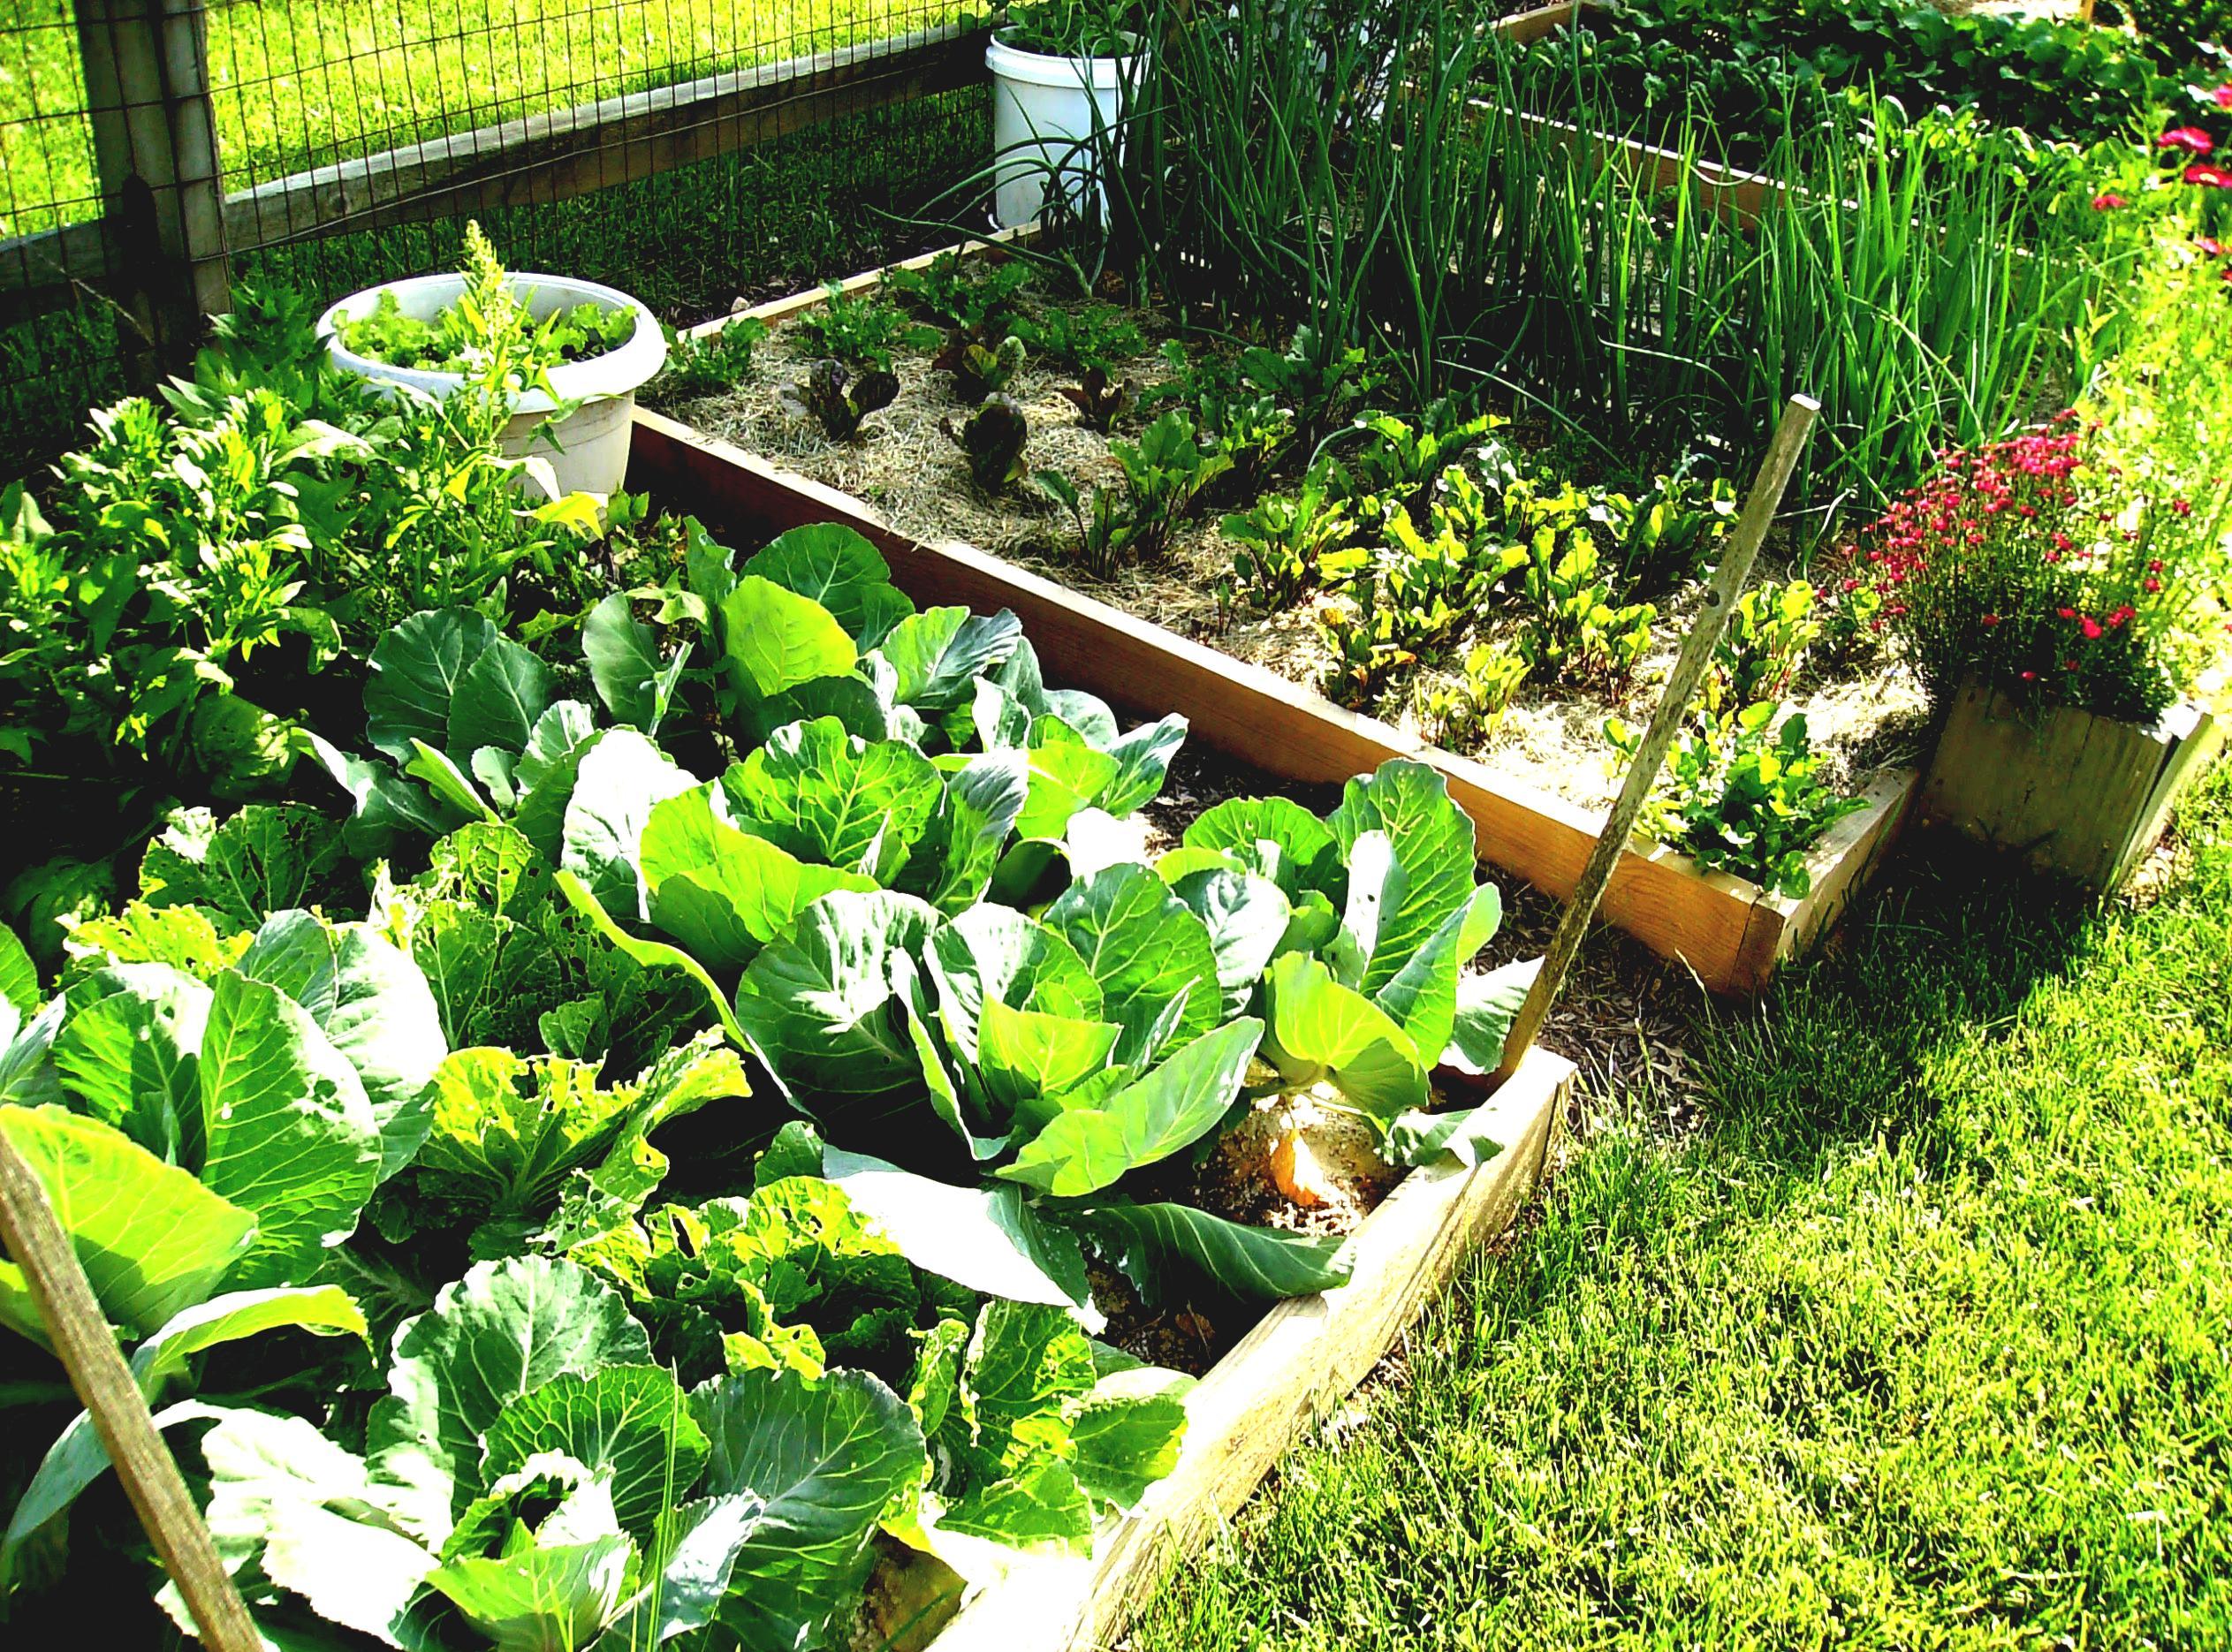 designing an urban vegetable garden photo - 3